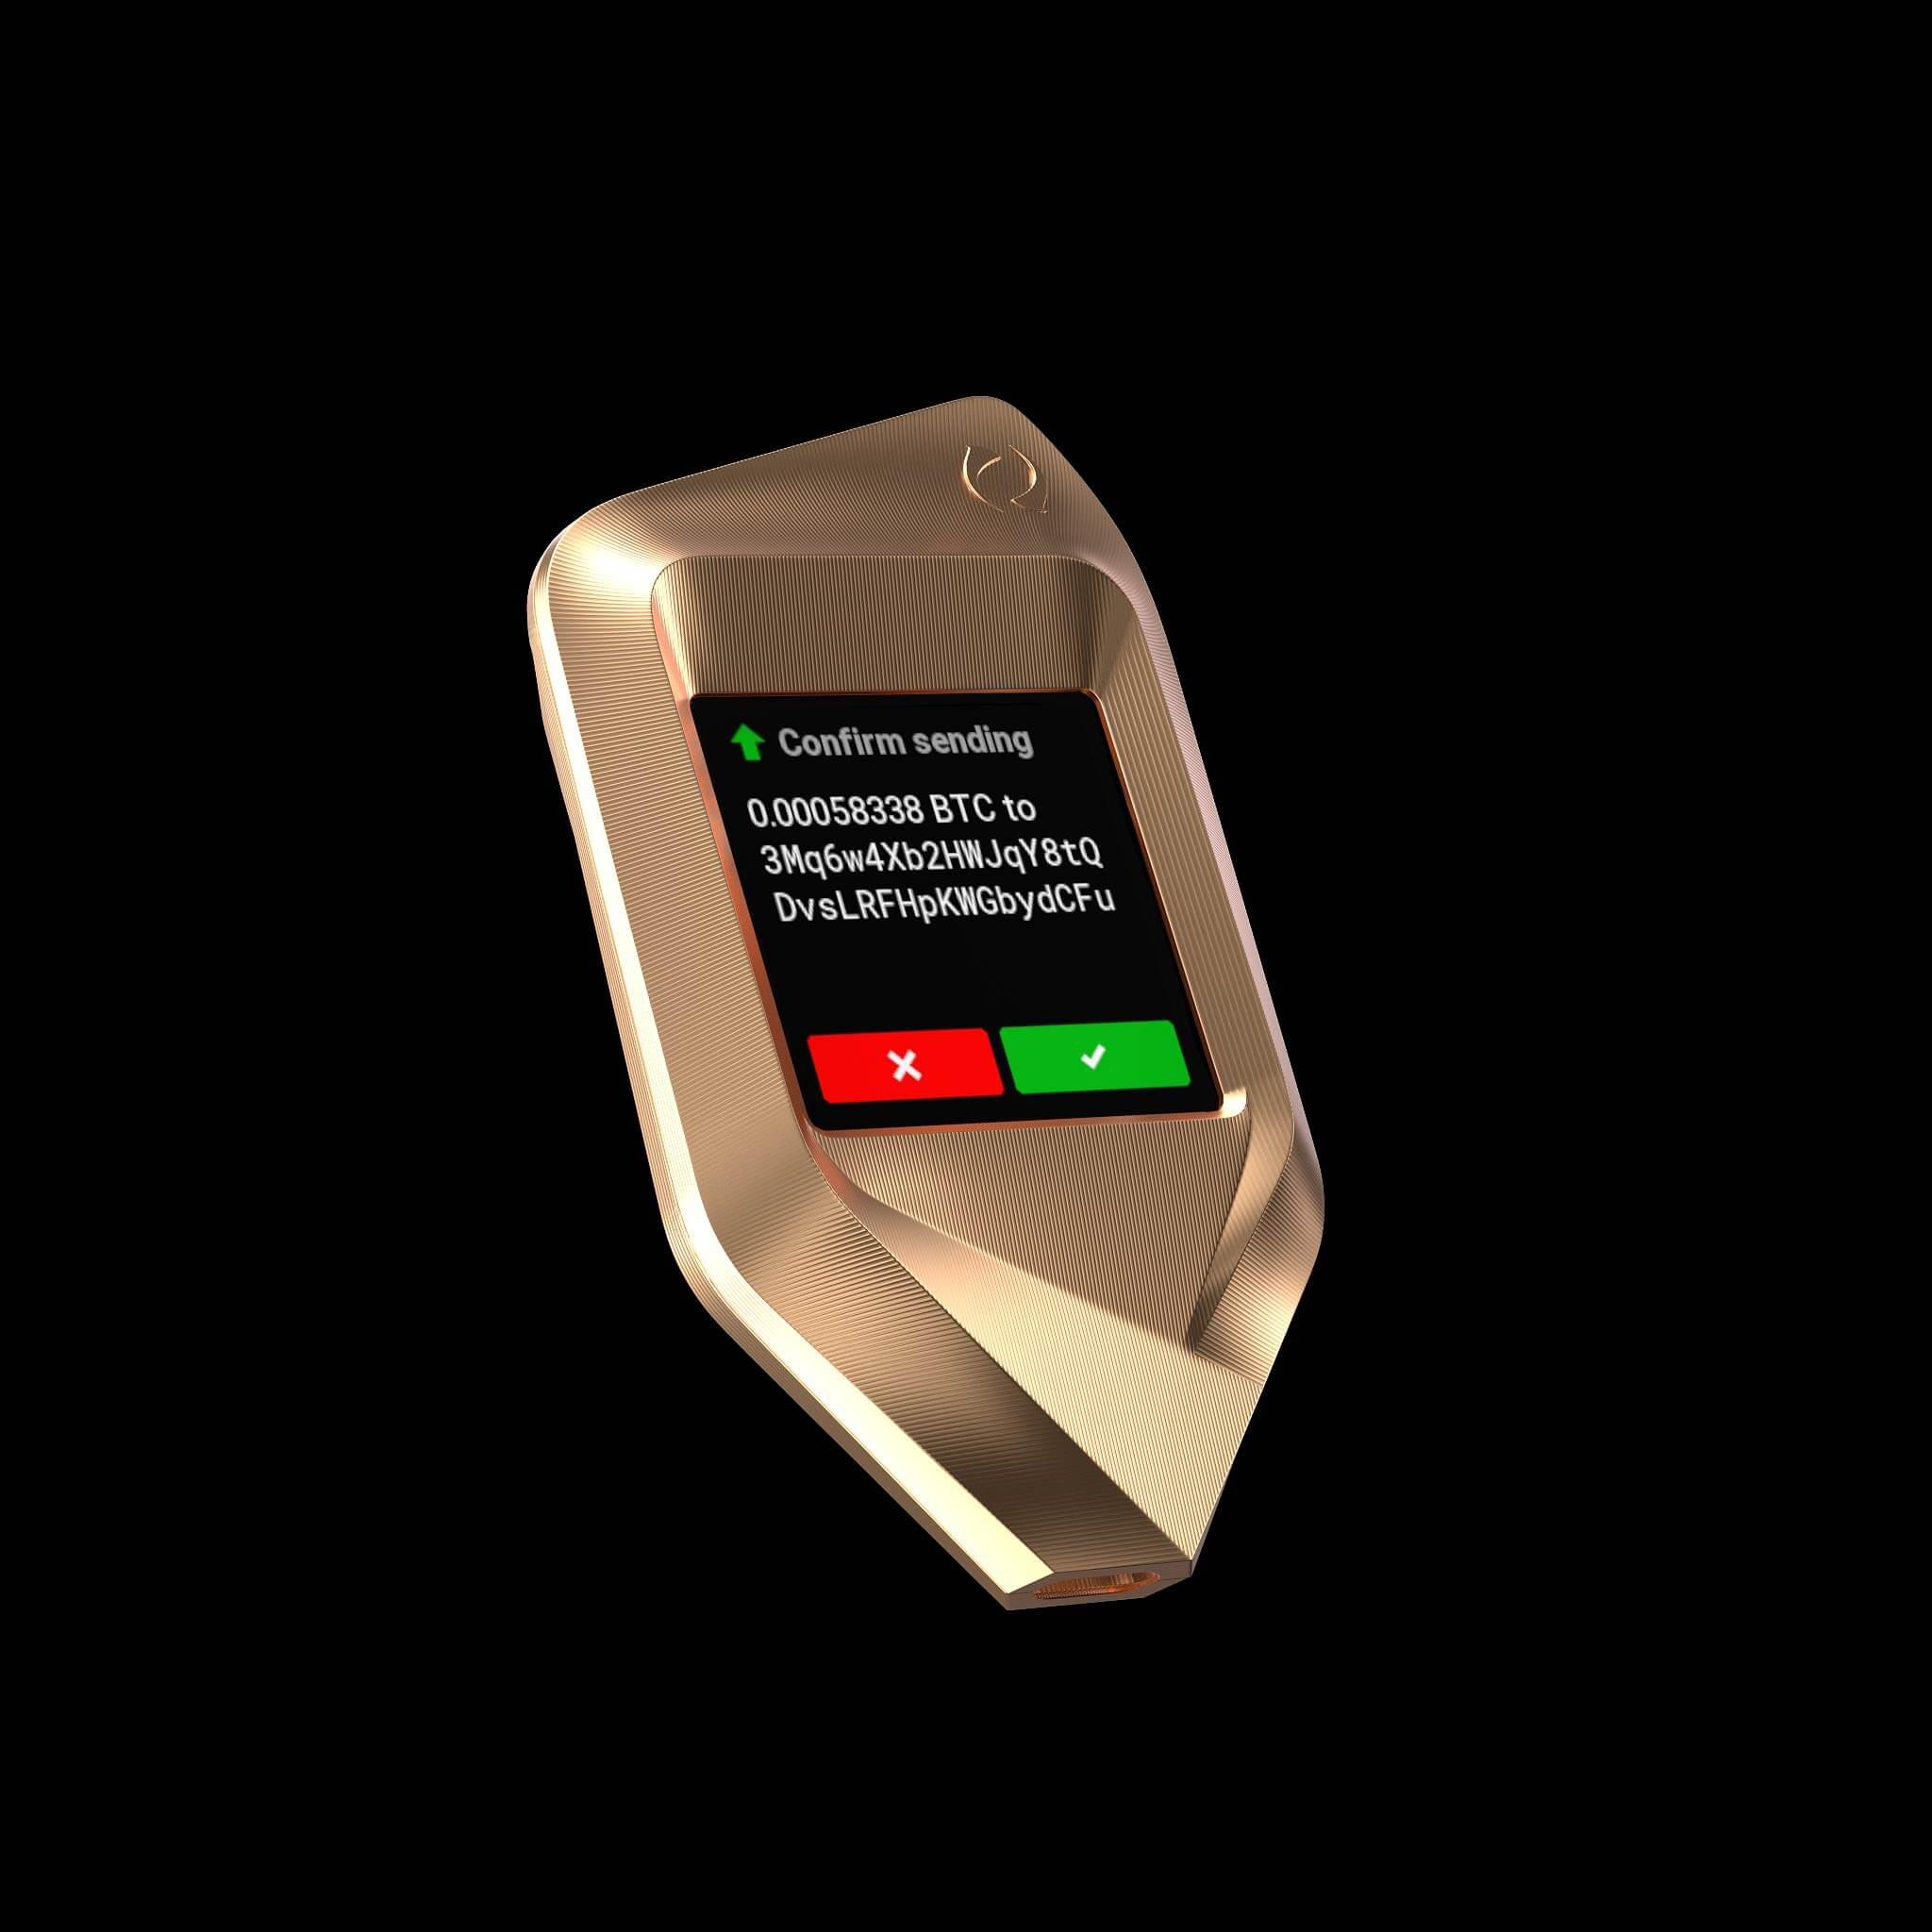 corazon rose gold titanium trezor bitcoin crypto hardware wallet